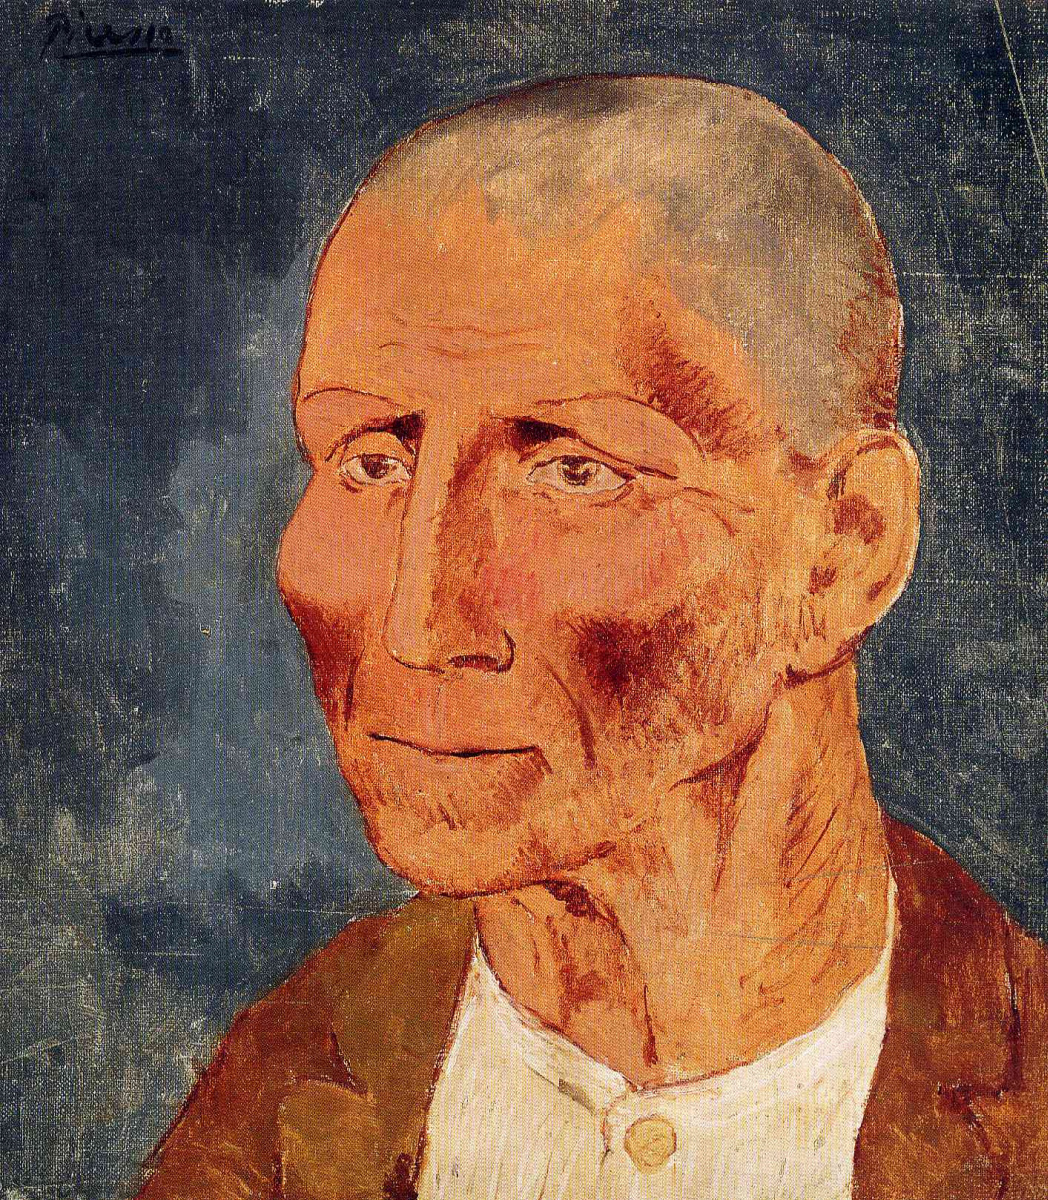 Пабло Пикассо. Хосеп Фондевила